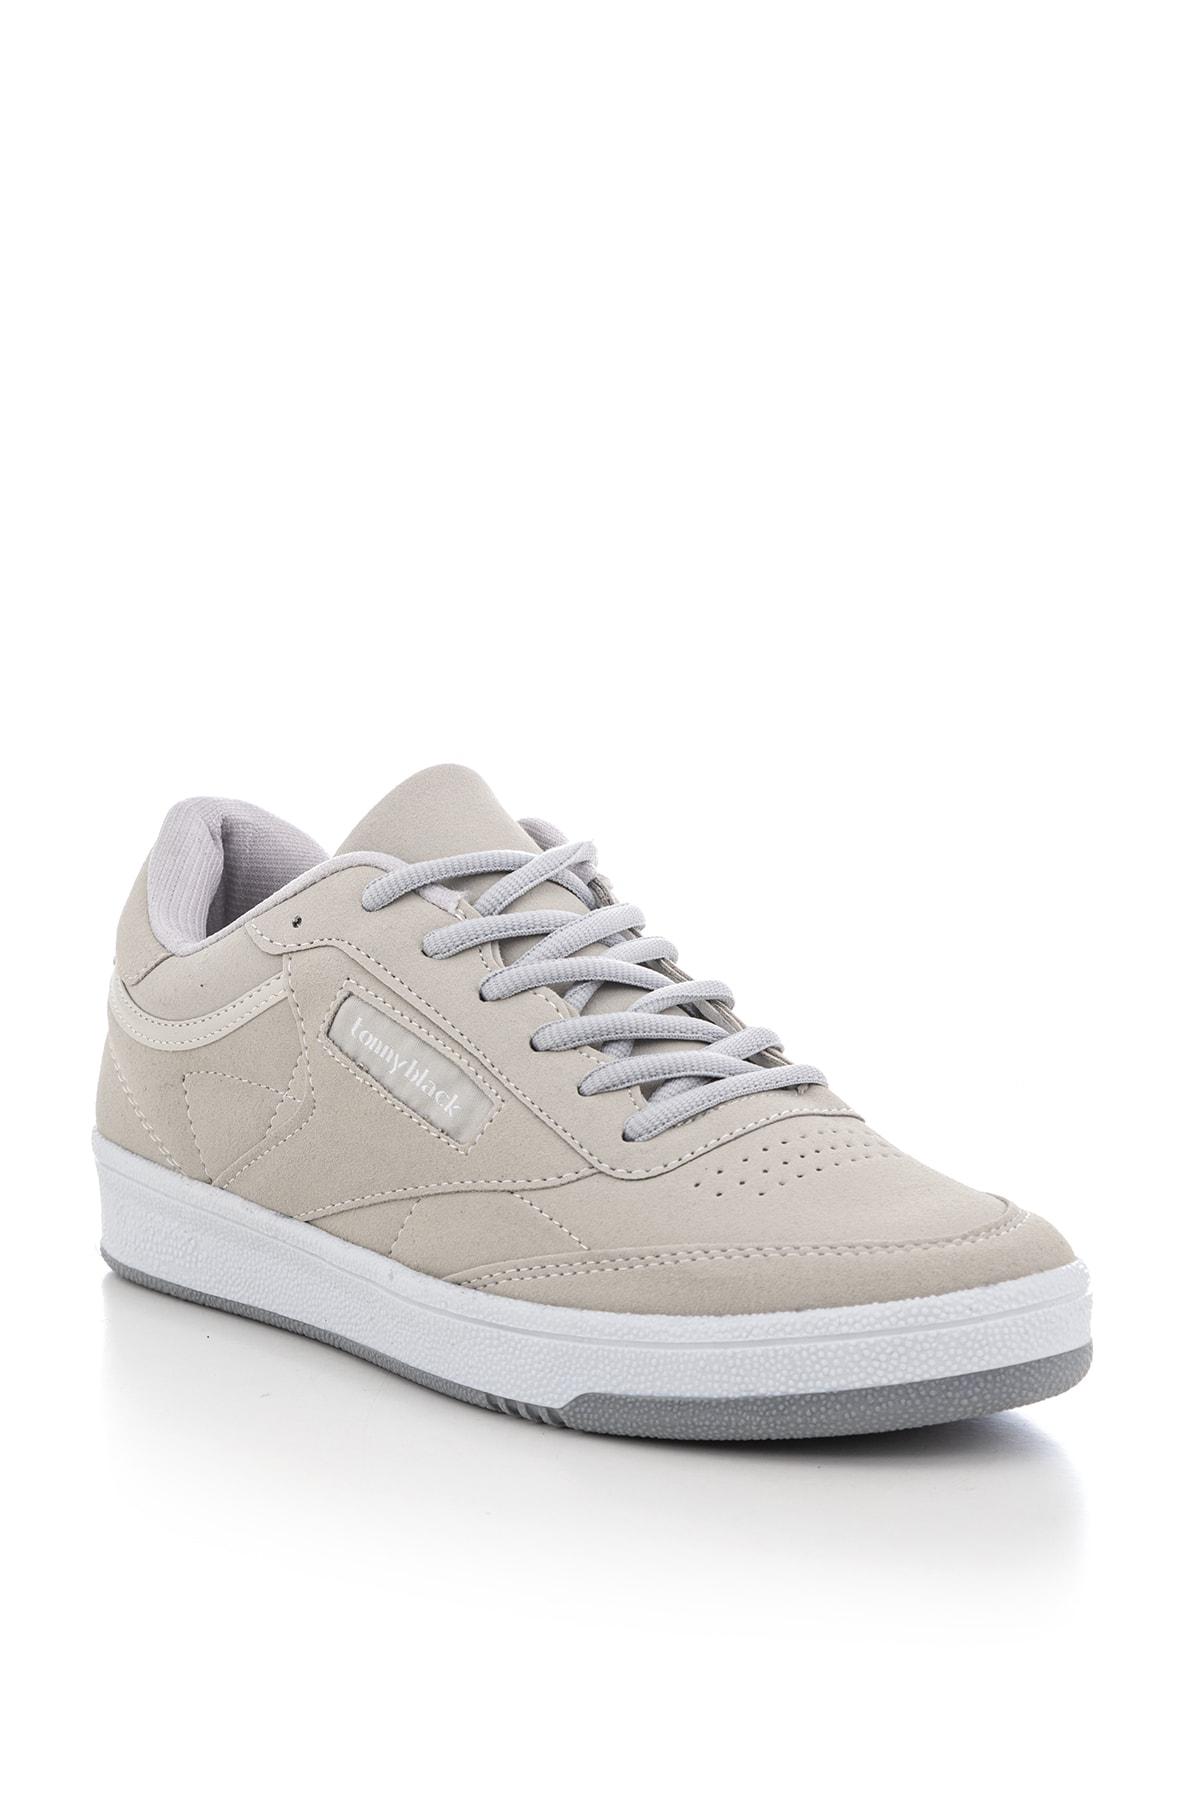 Tonny Black Gri Süet Unisex Sneaker TB107-0